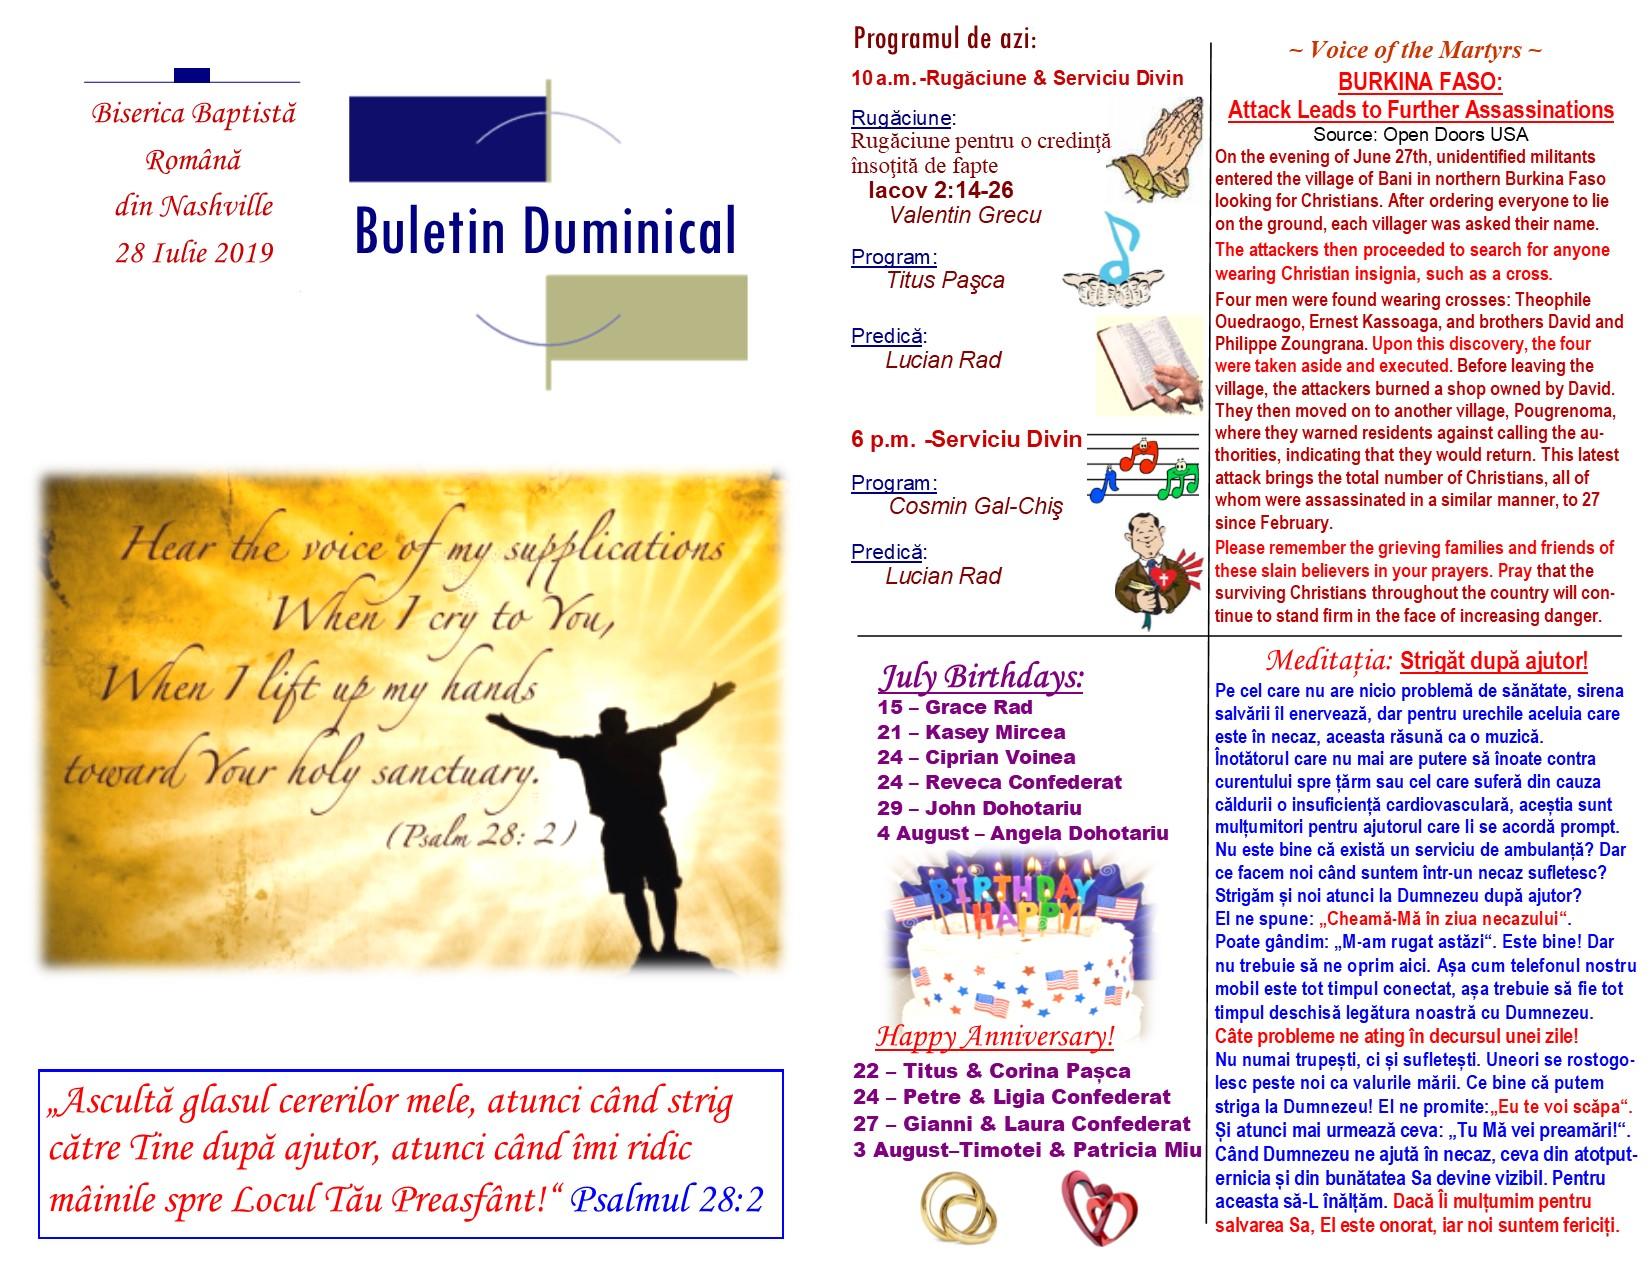 Buletin 07-28-19 page 1 & 2